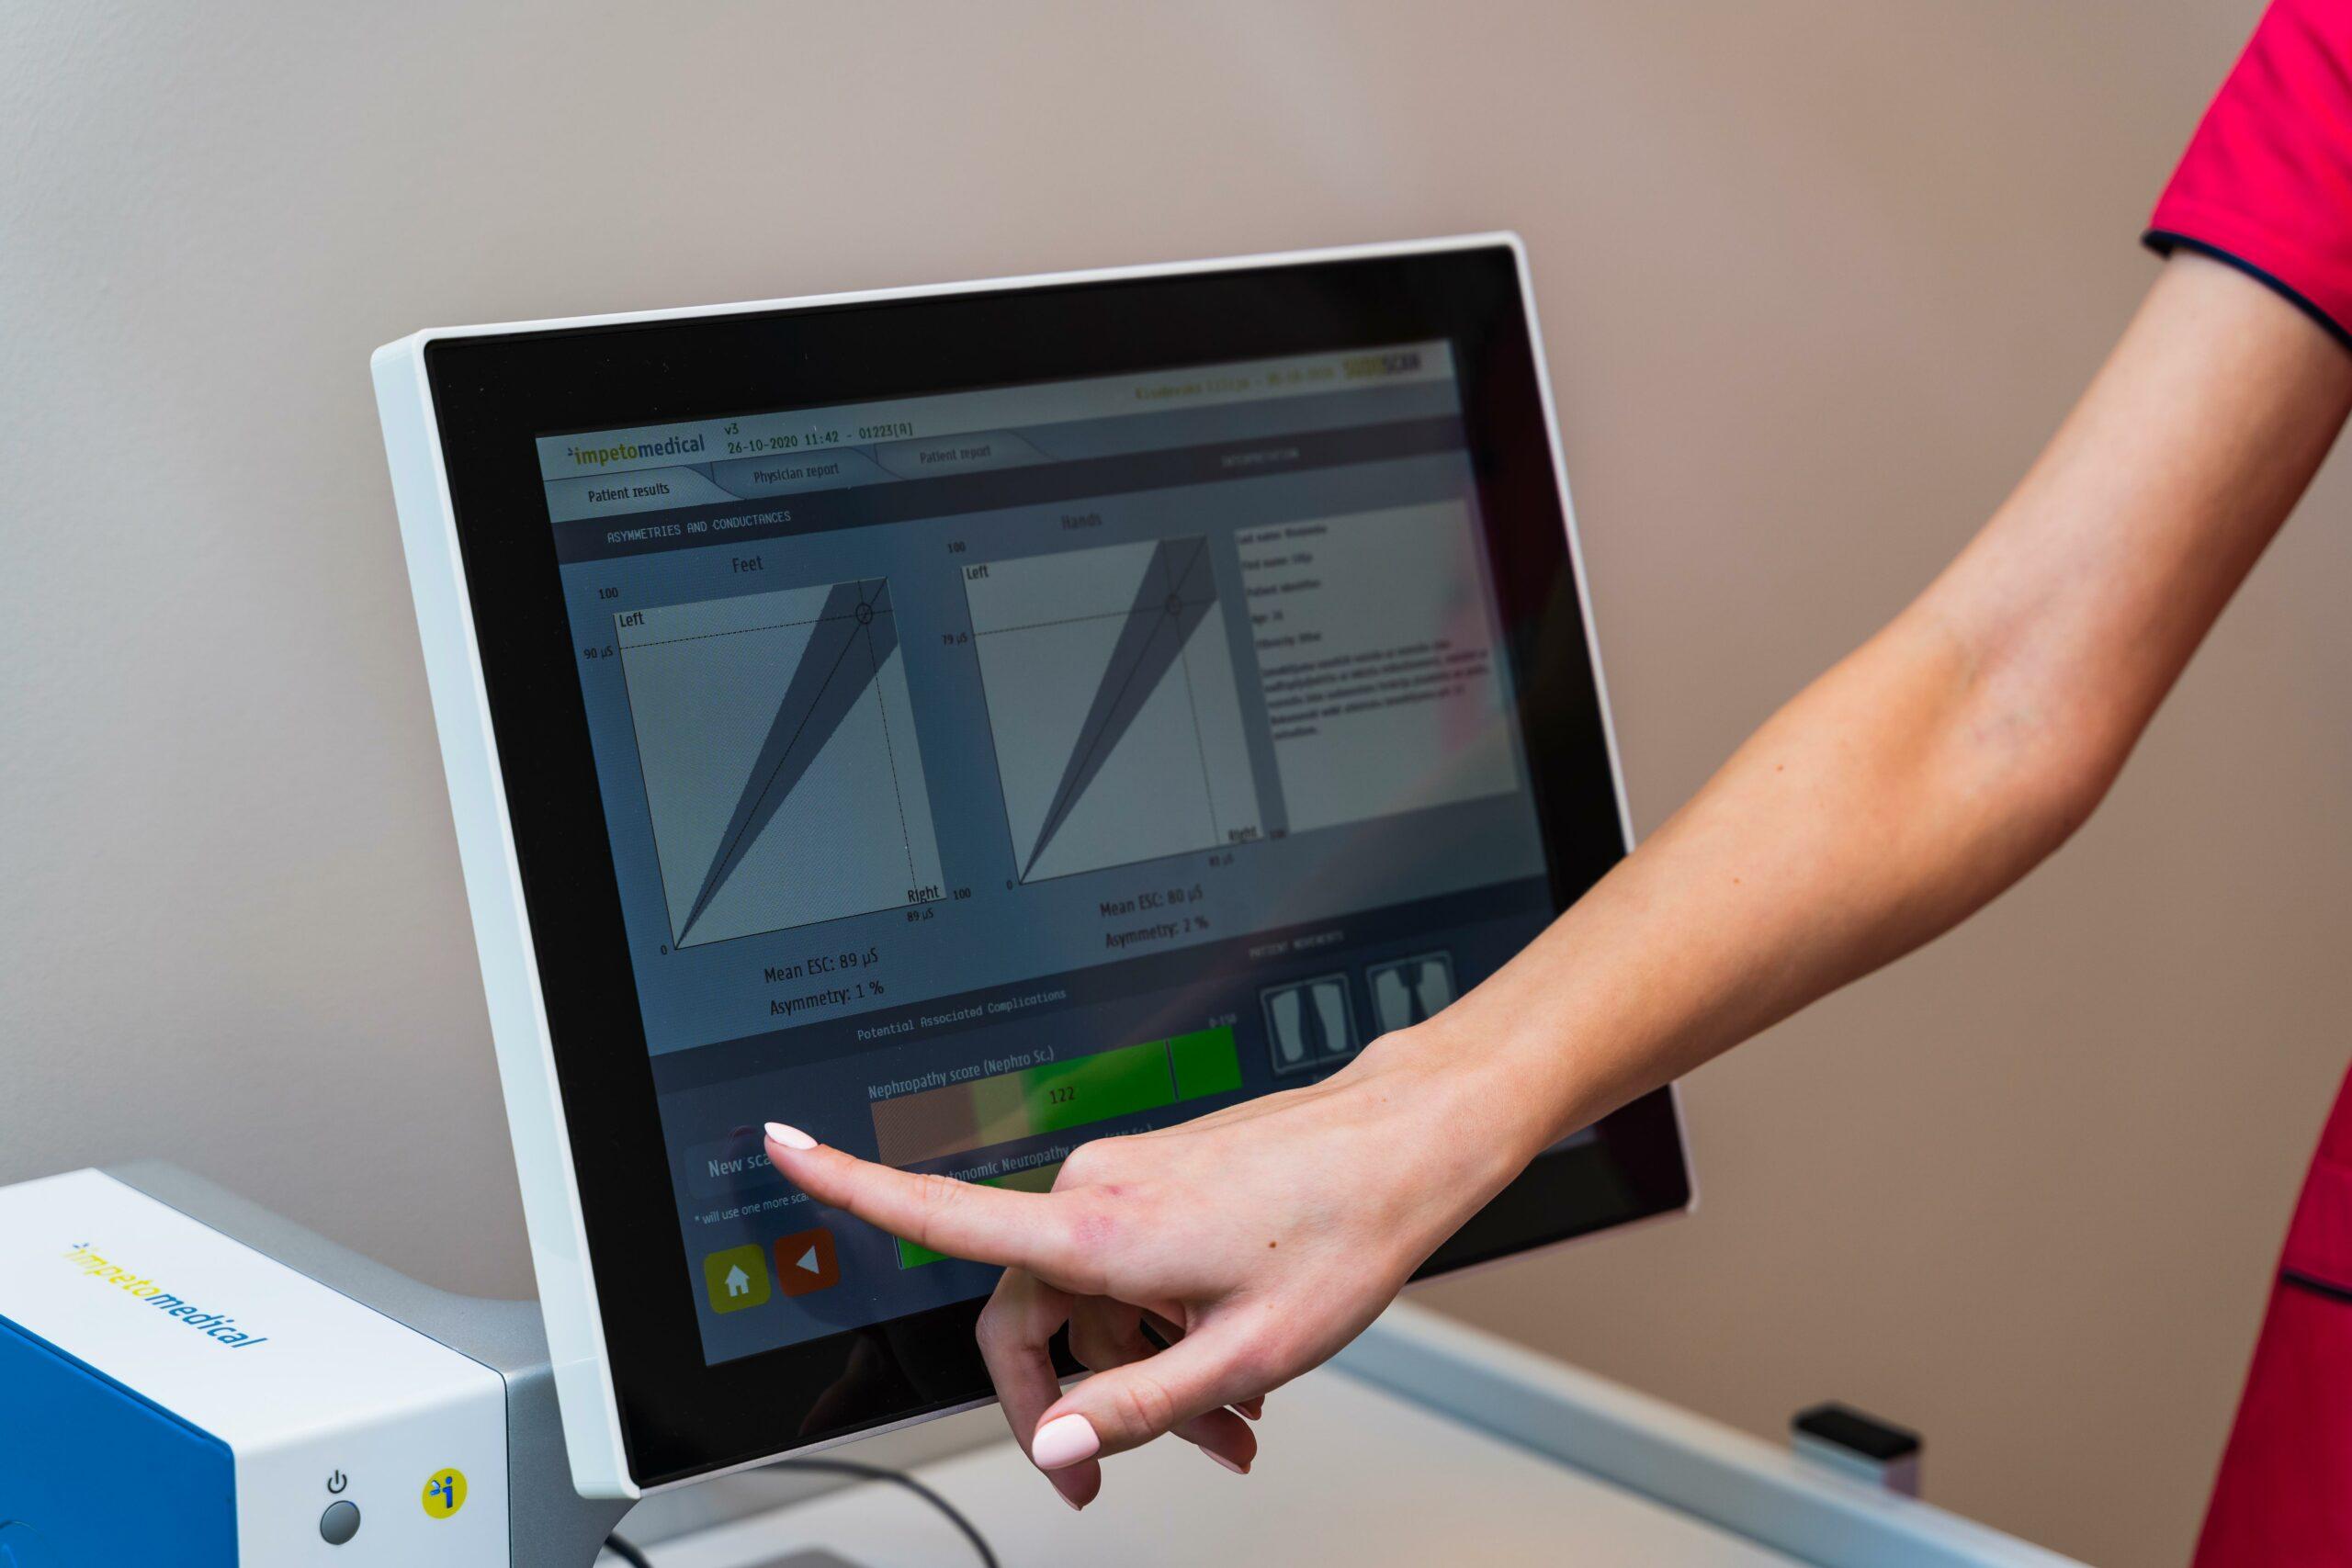 Perifero-autonomas-nervu-sistemas-nervu-testesana1-scaled.jpg